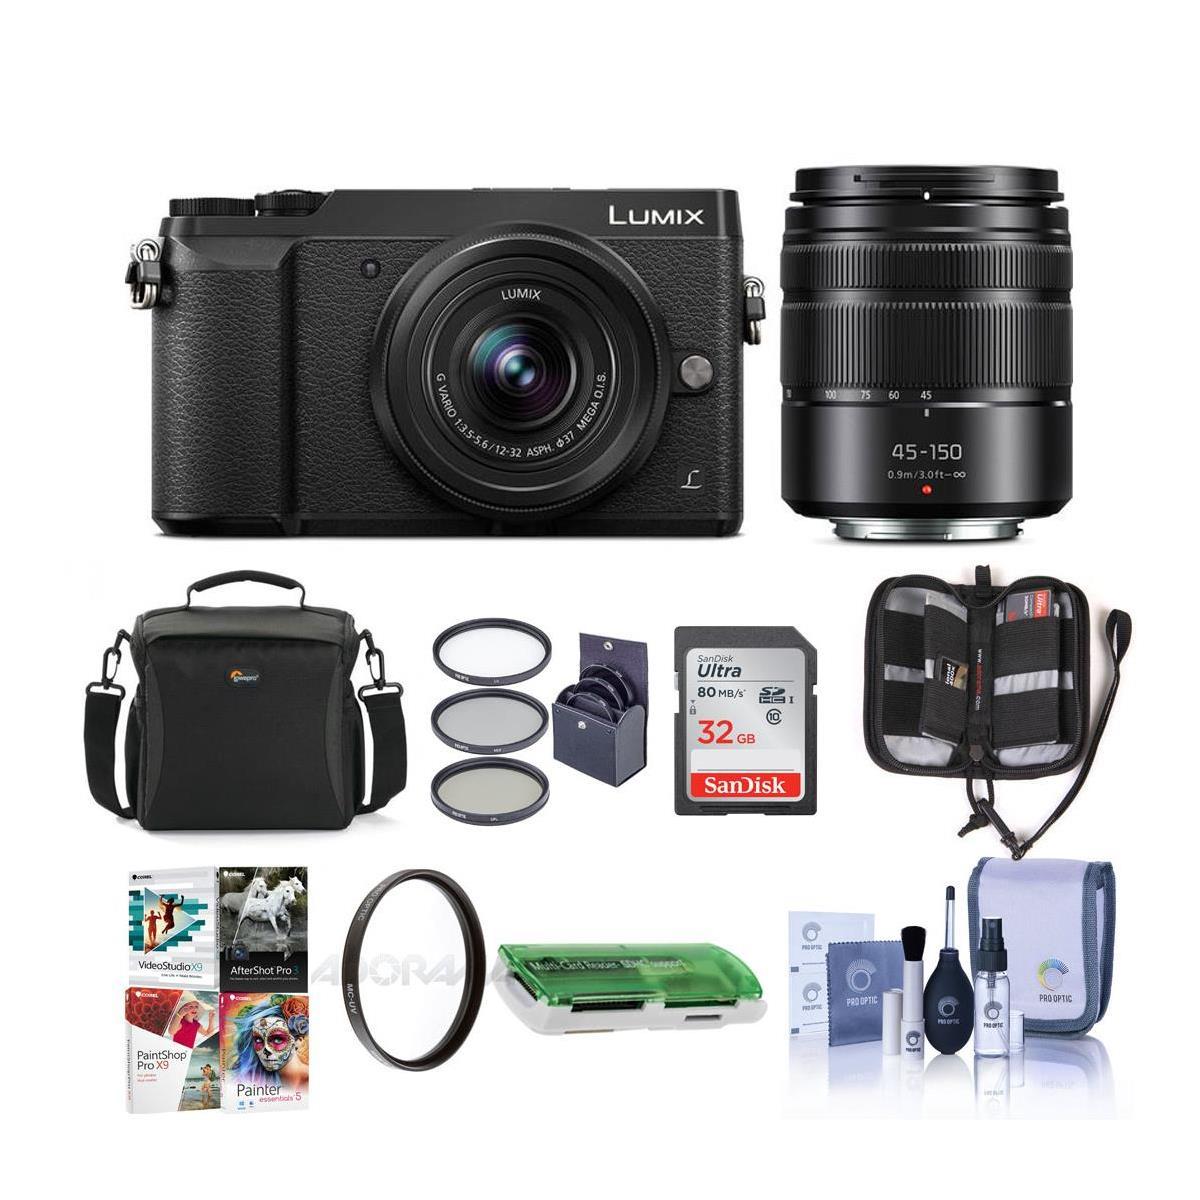 Panasonic LUMIX GX85 4K Mirrorless Camera Kit w/ 12-32mm + 45-150mm Lenses $437.99